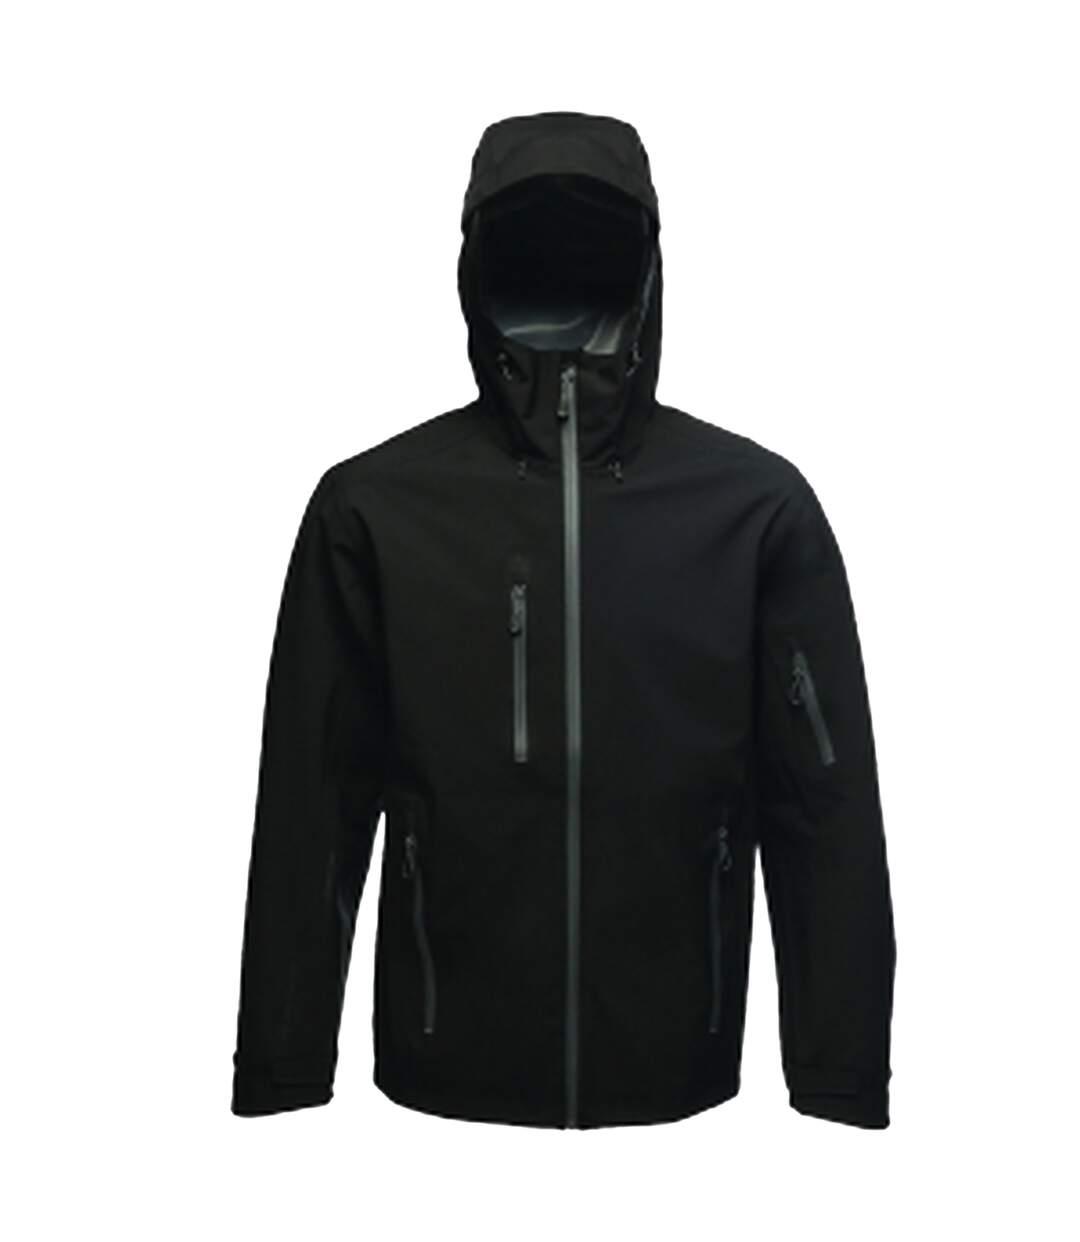 Regatta Mens Triode 3 Layer Waterproof Shell Jacket (Black) - UTRG3544